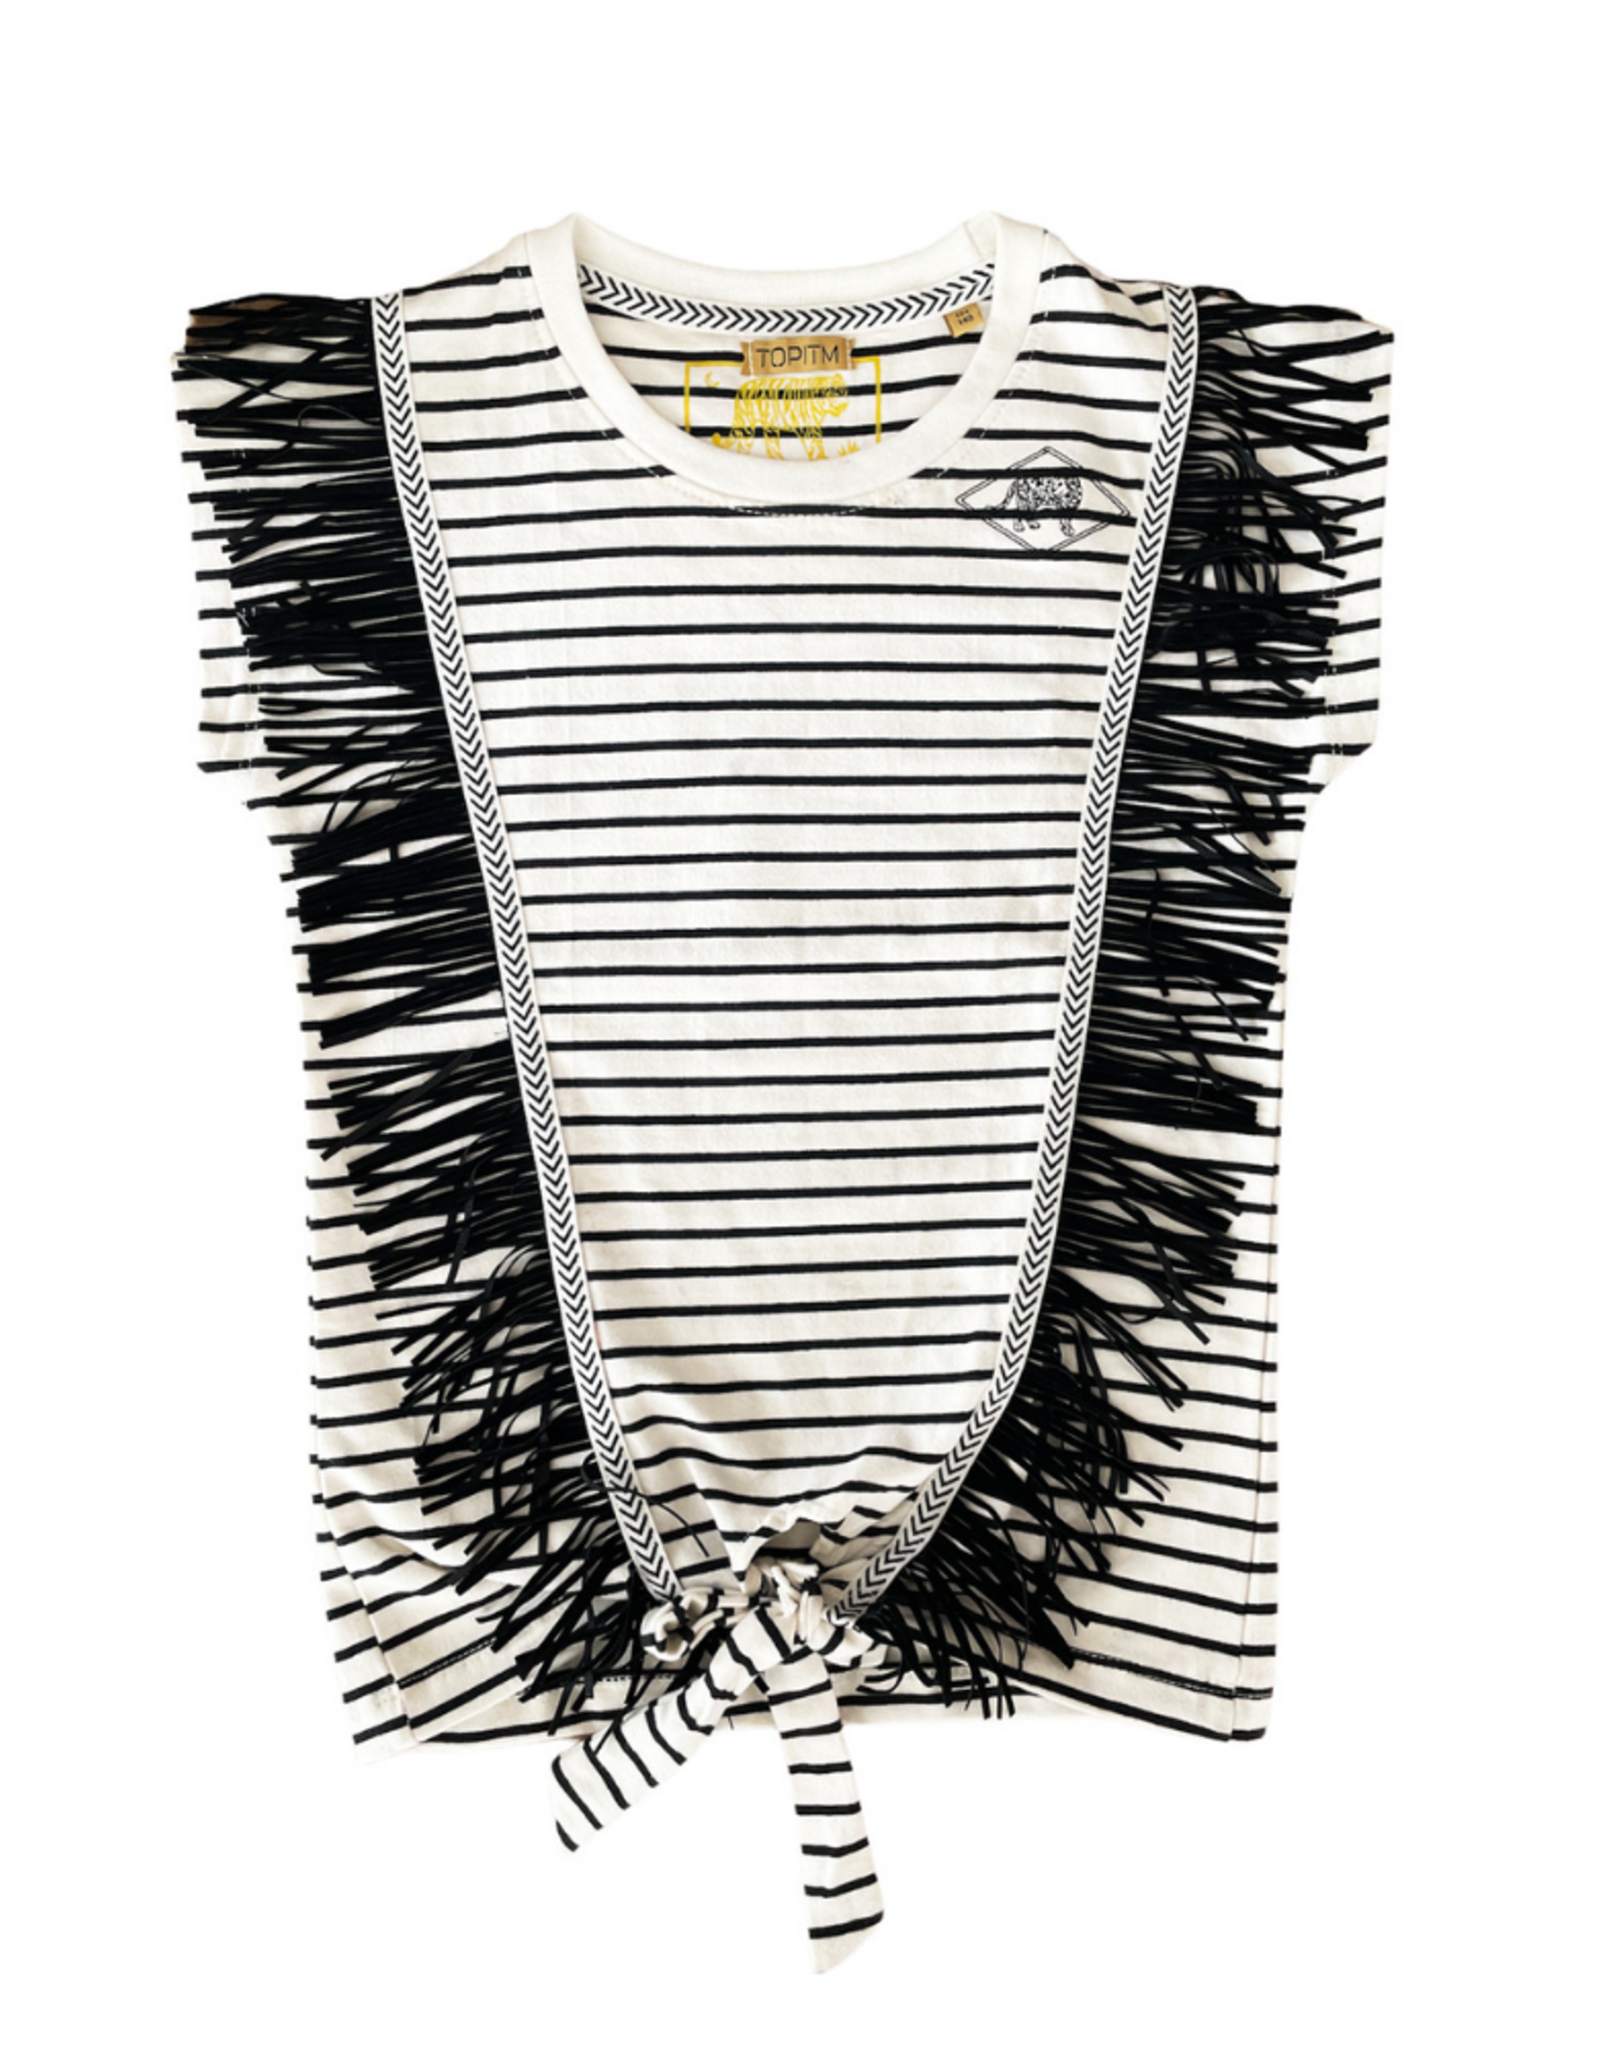 Topitm TOPitm shirt Colette streep black